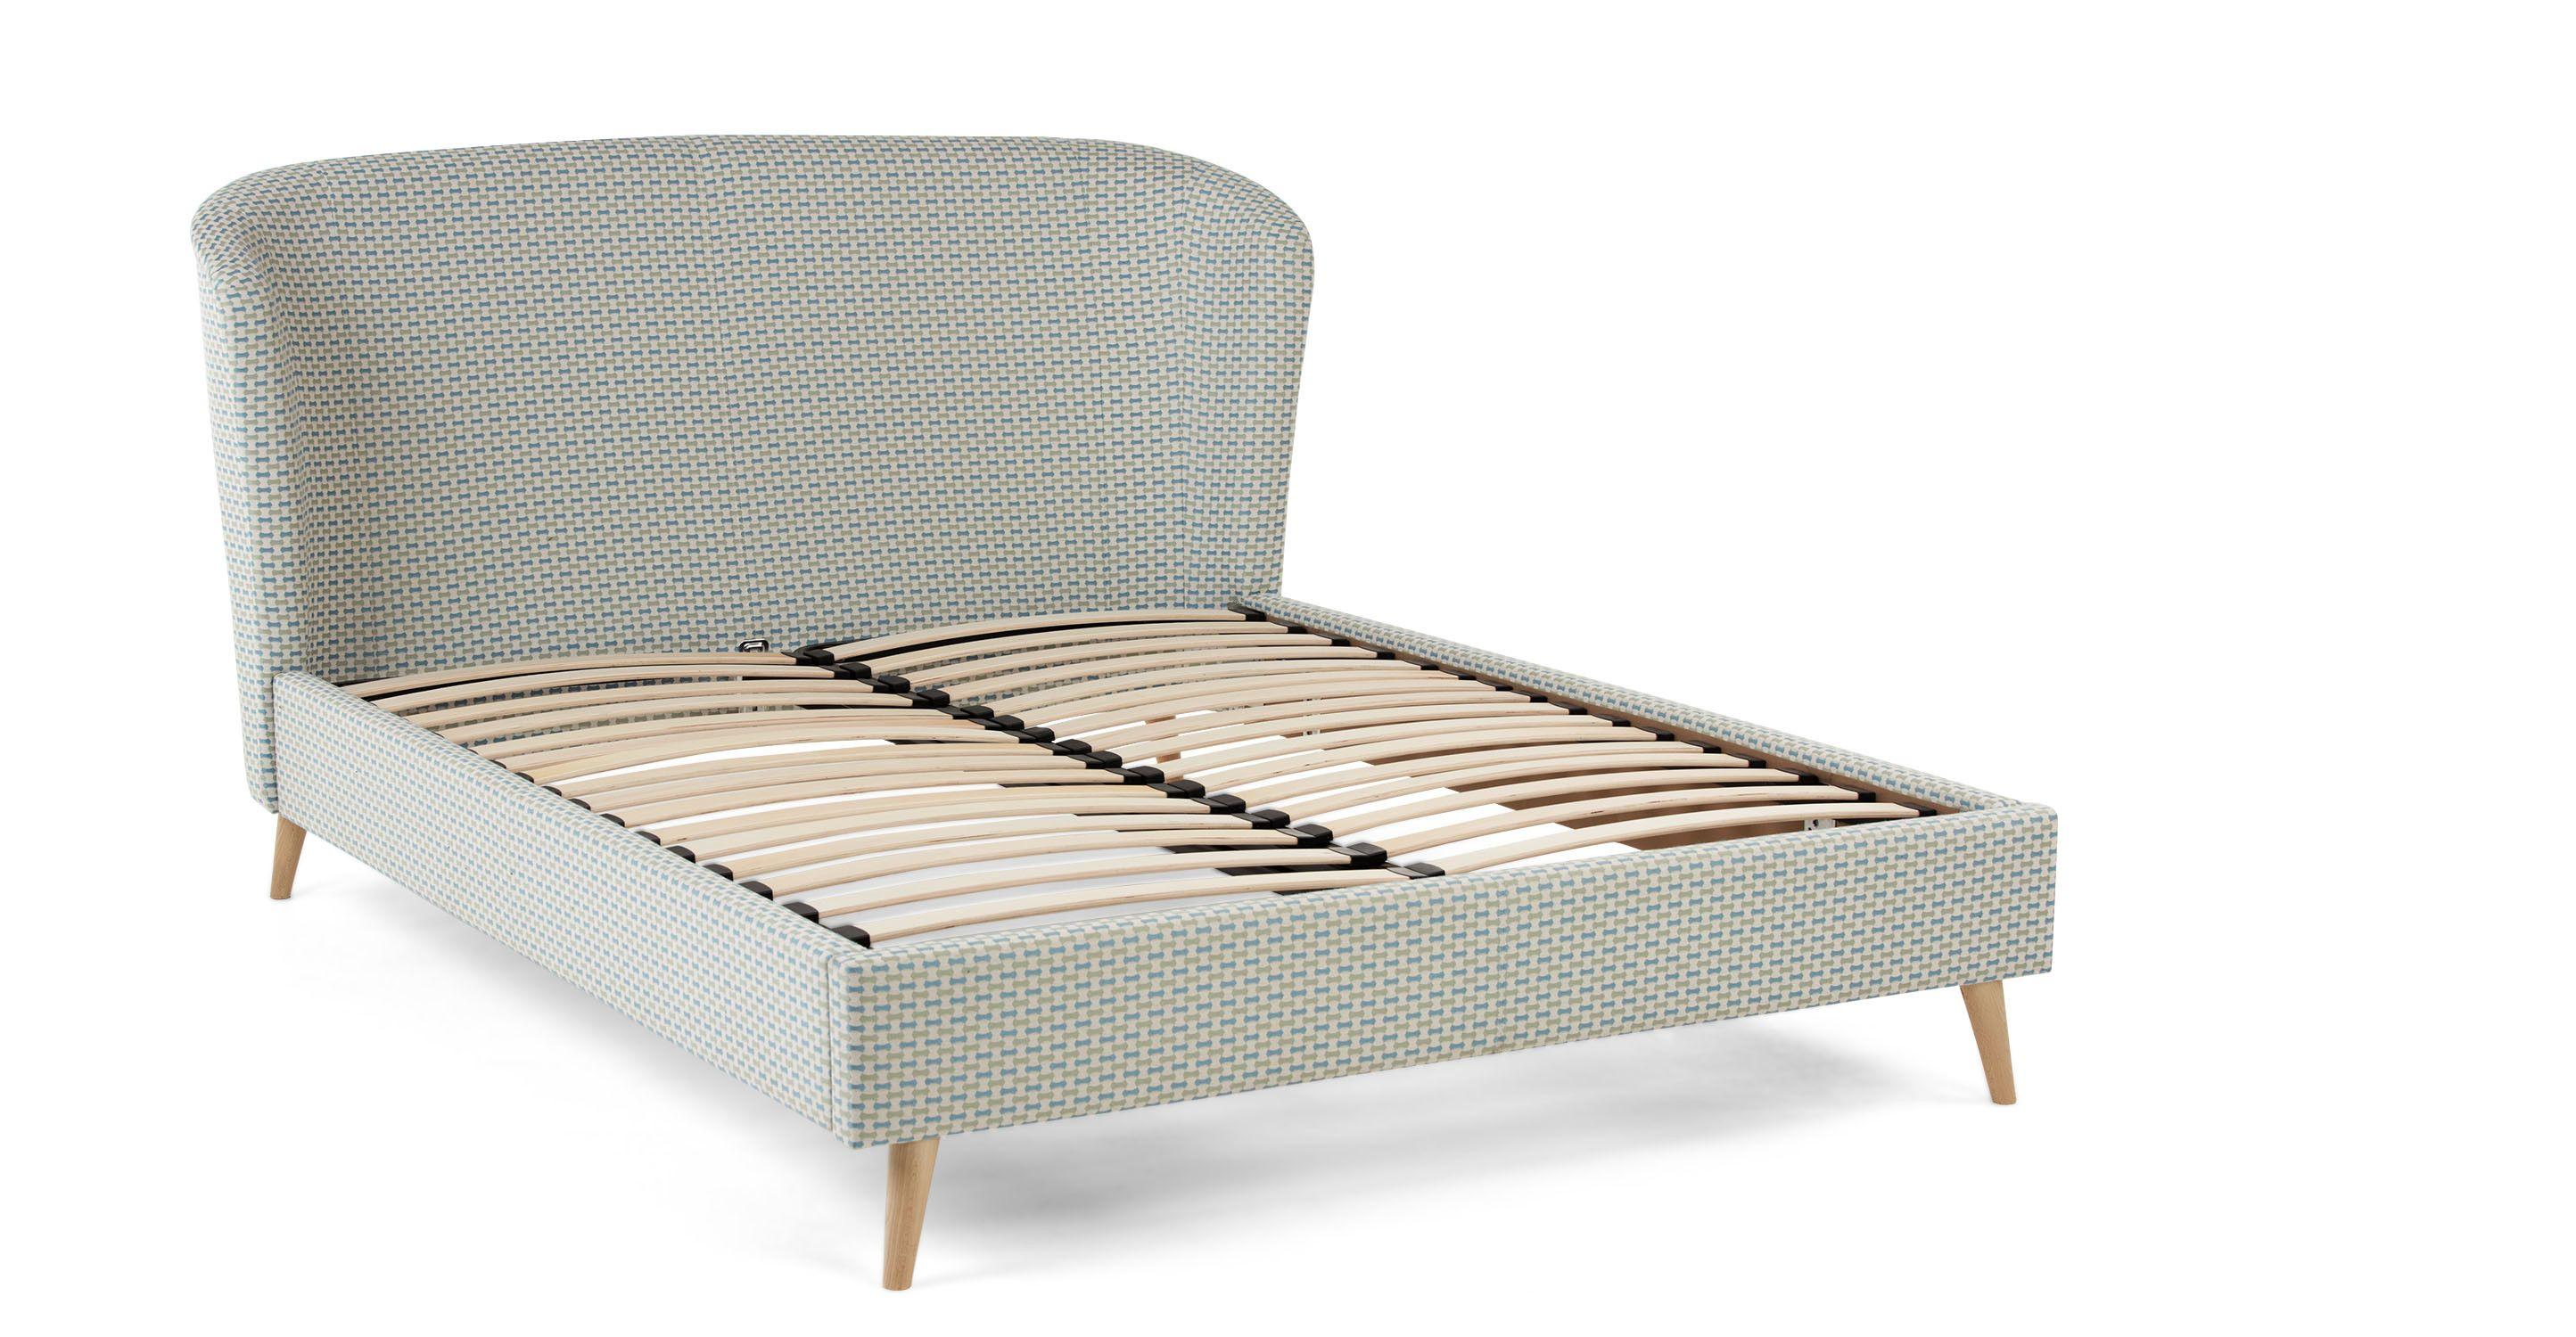 Lulu Doppelbett 140 X 200 Cm Wabenmuster Bett Bett Ideen Und